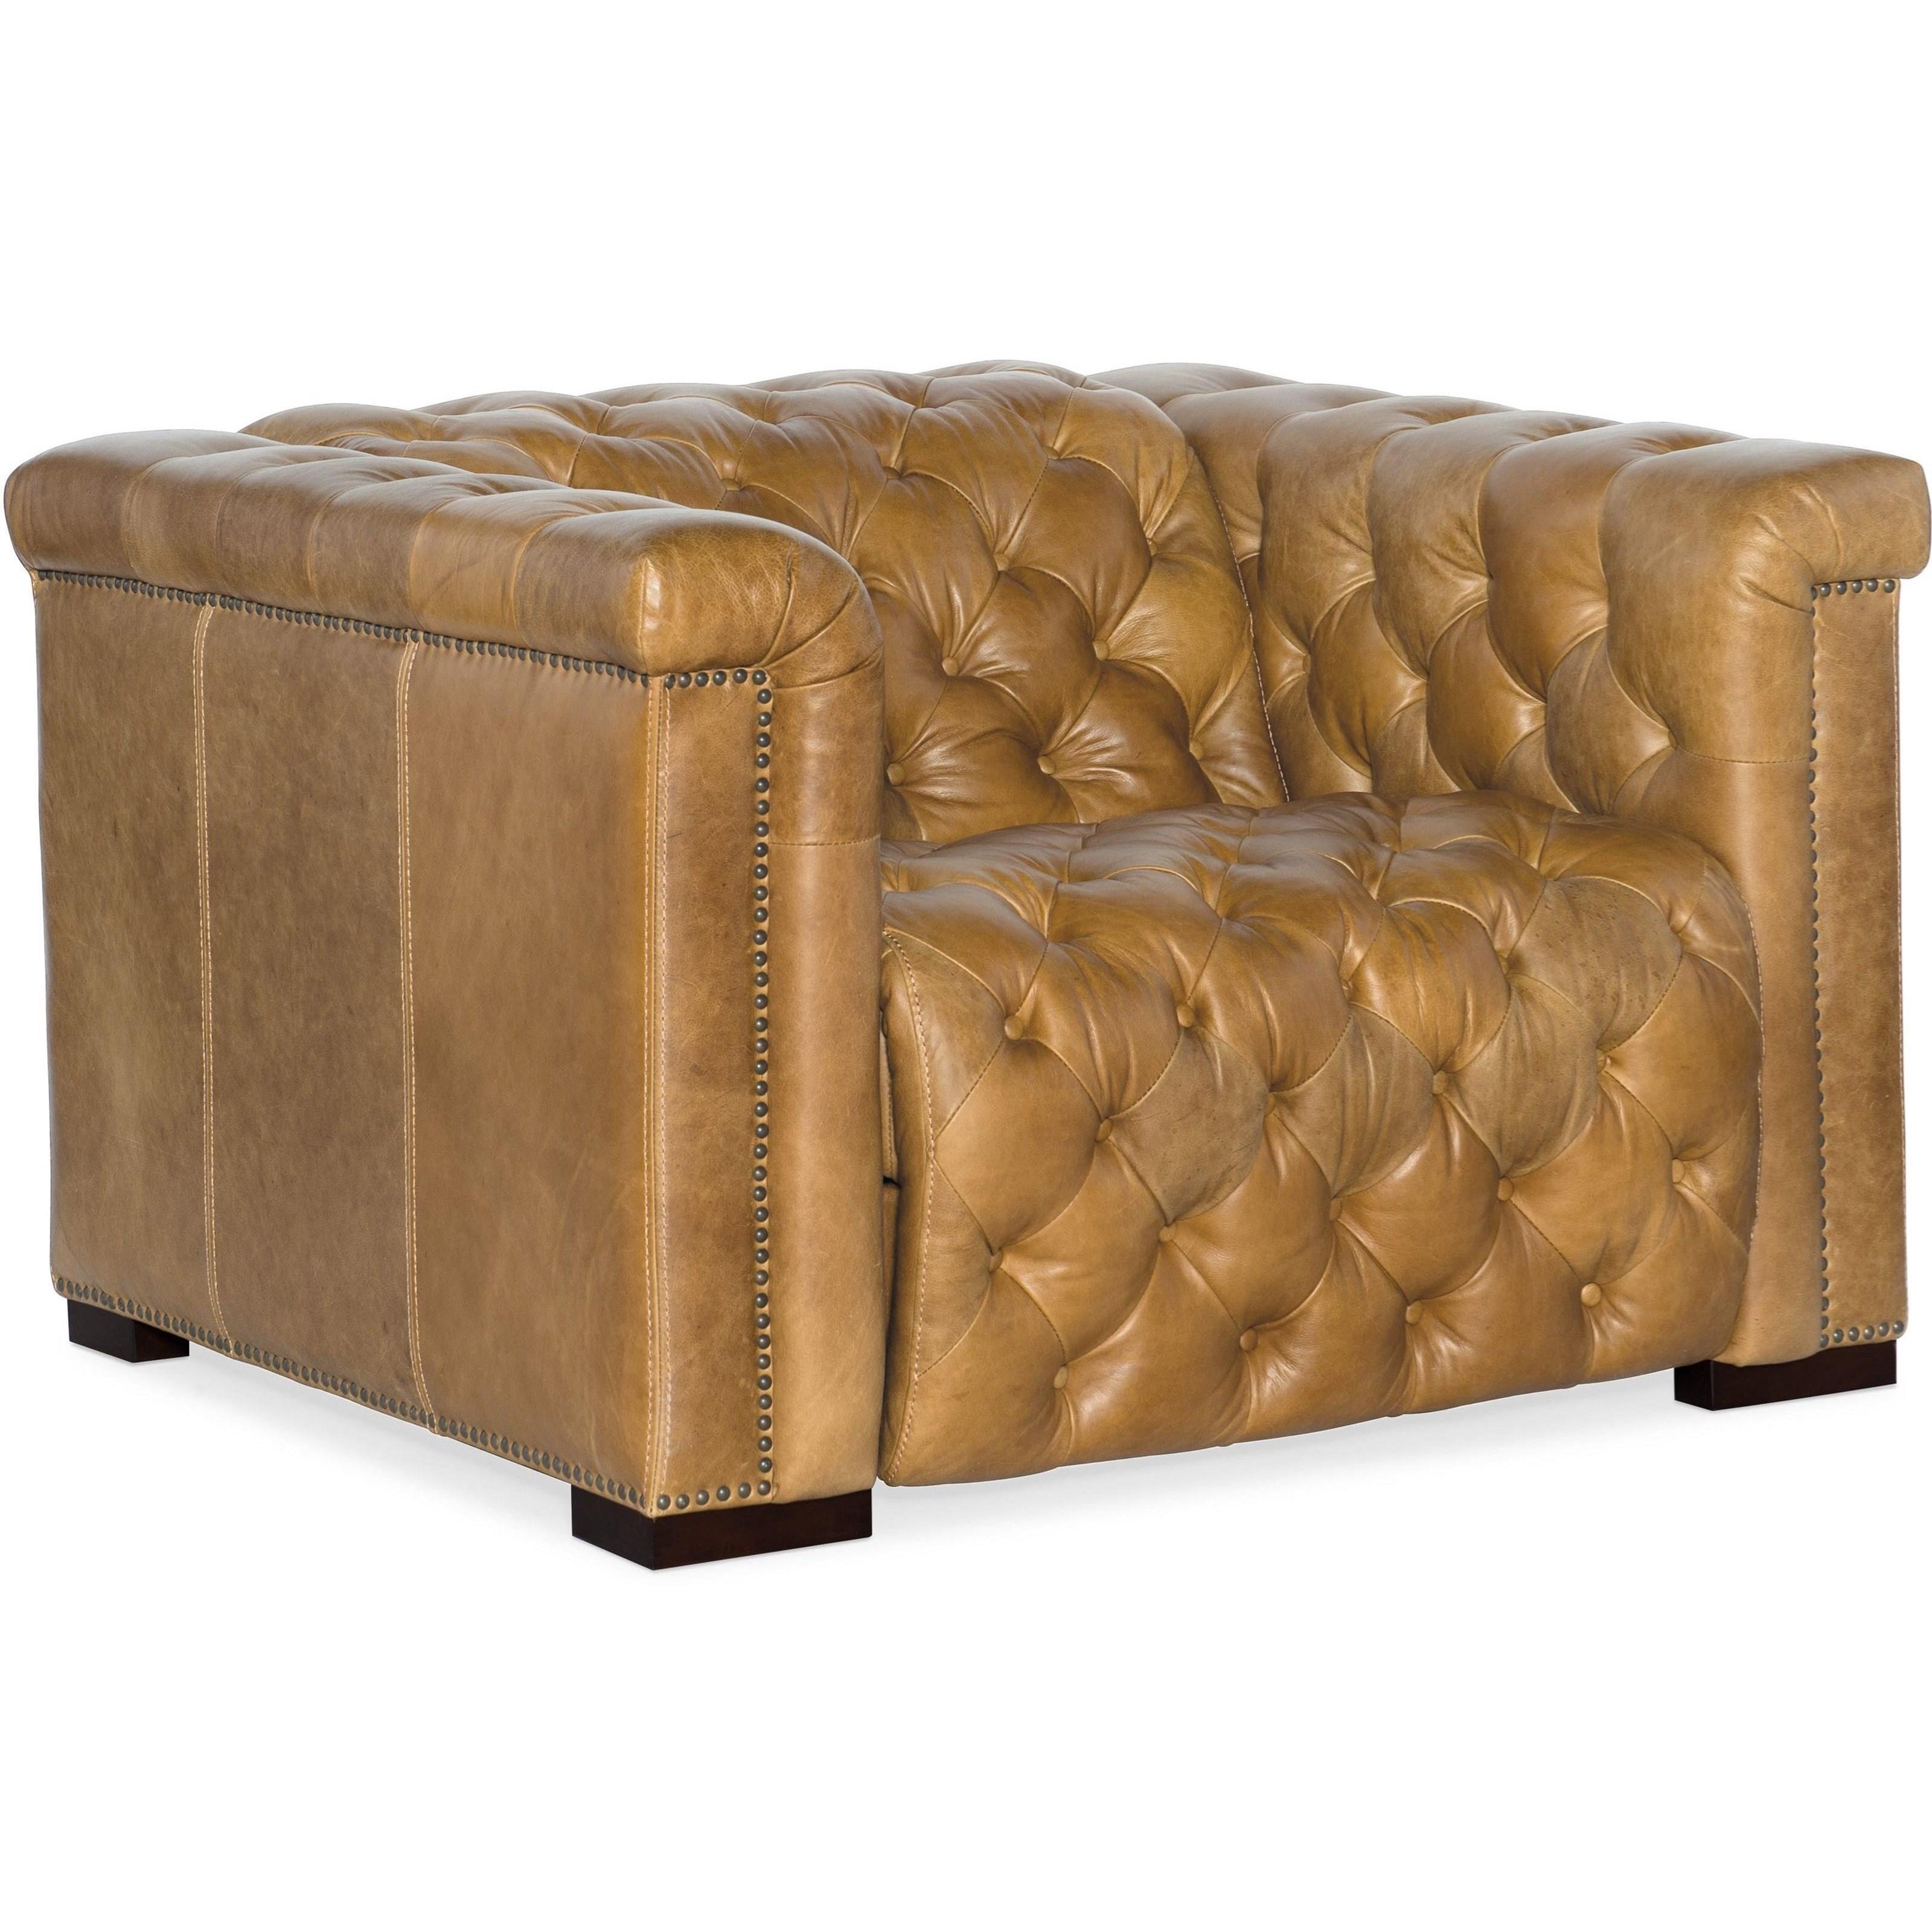 Savion Grandier Power Leather Recliner by Hooker Furniture at Baer's Furniture